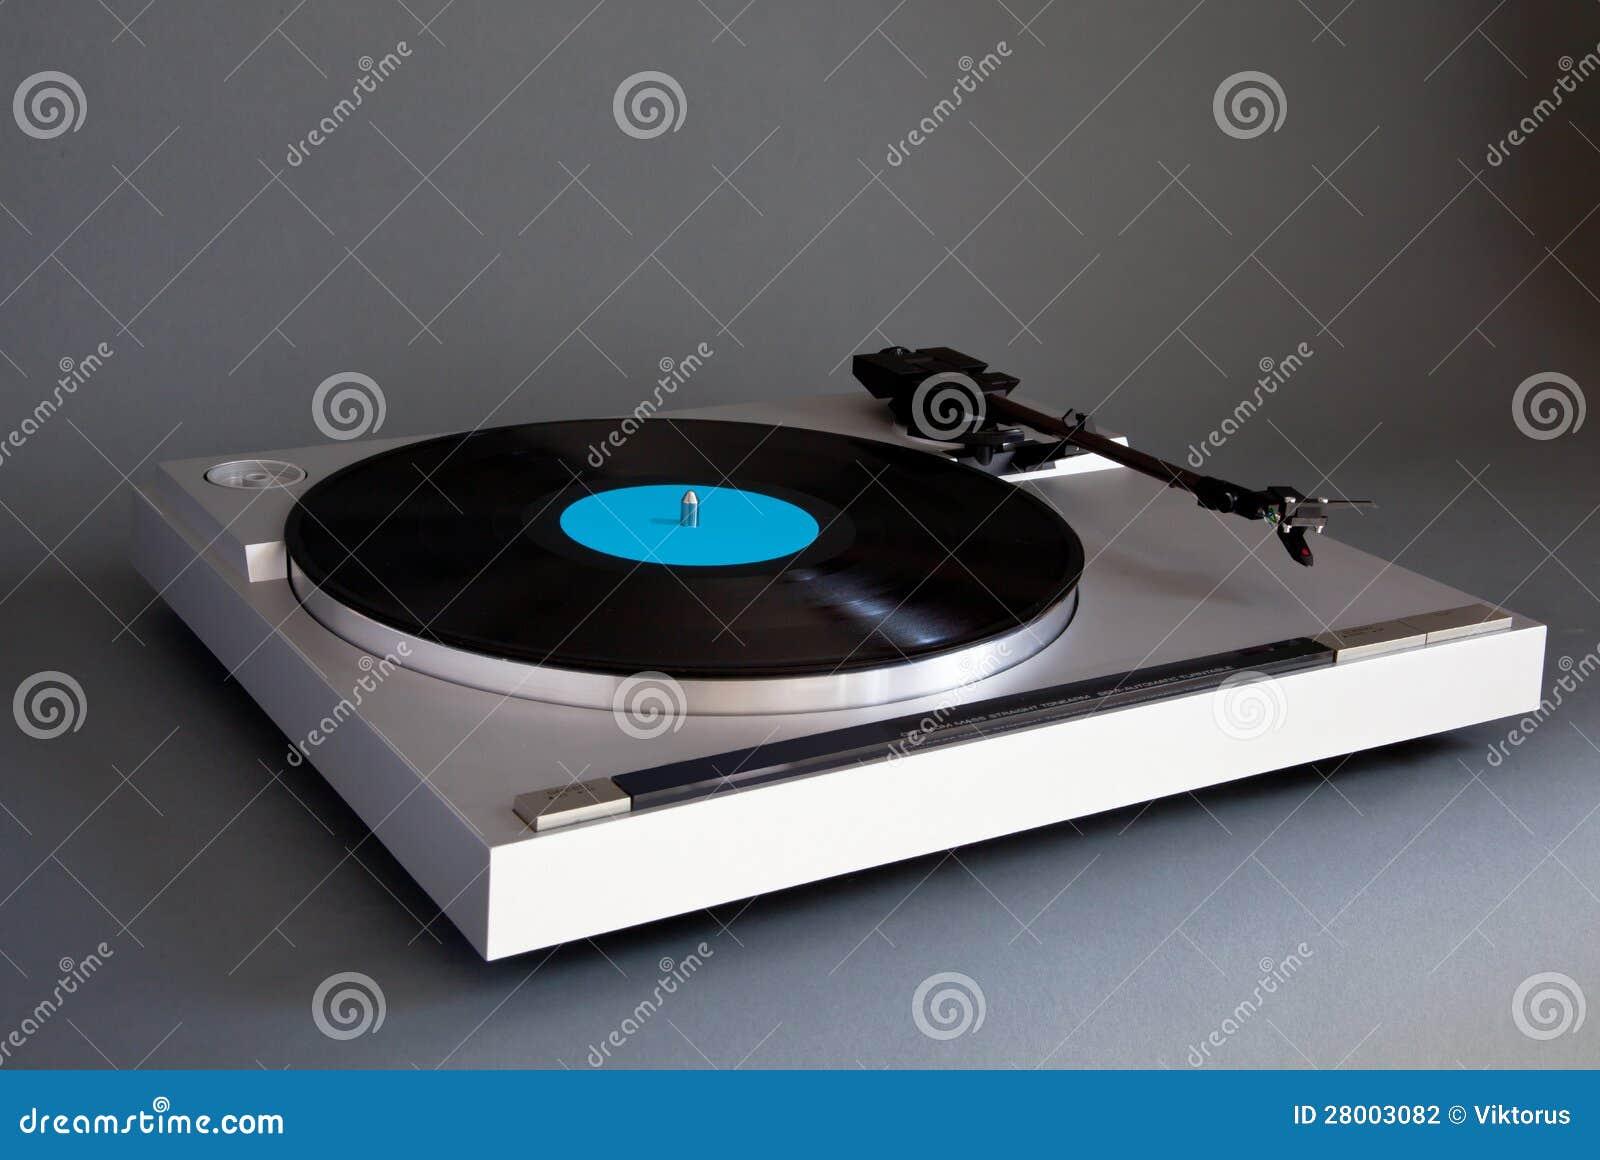 Analog Stereo Turntable Vinyl Record Player Stock Photo